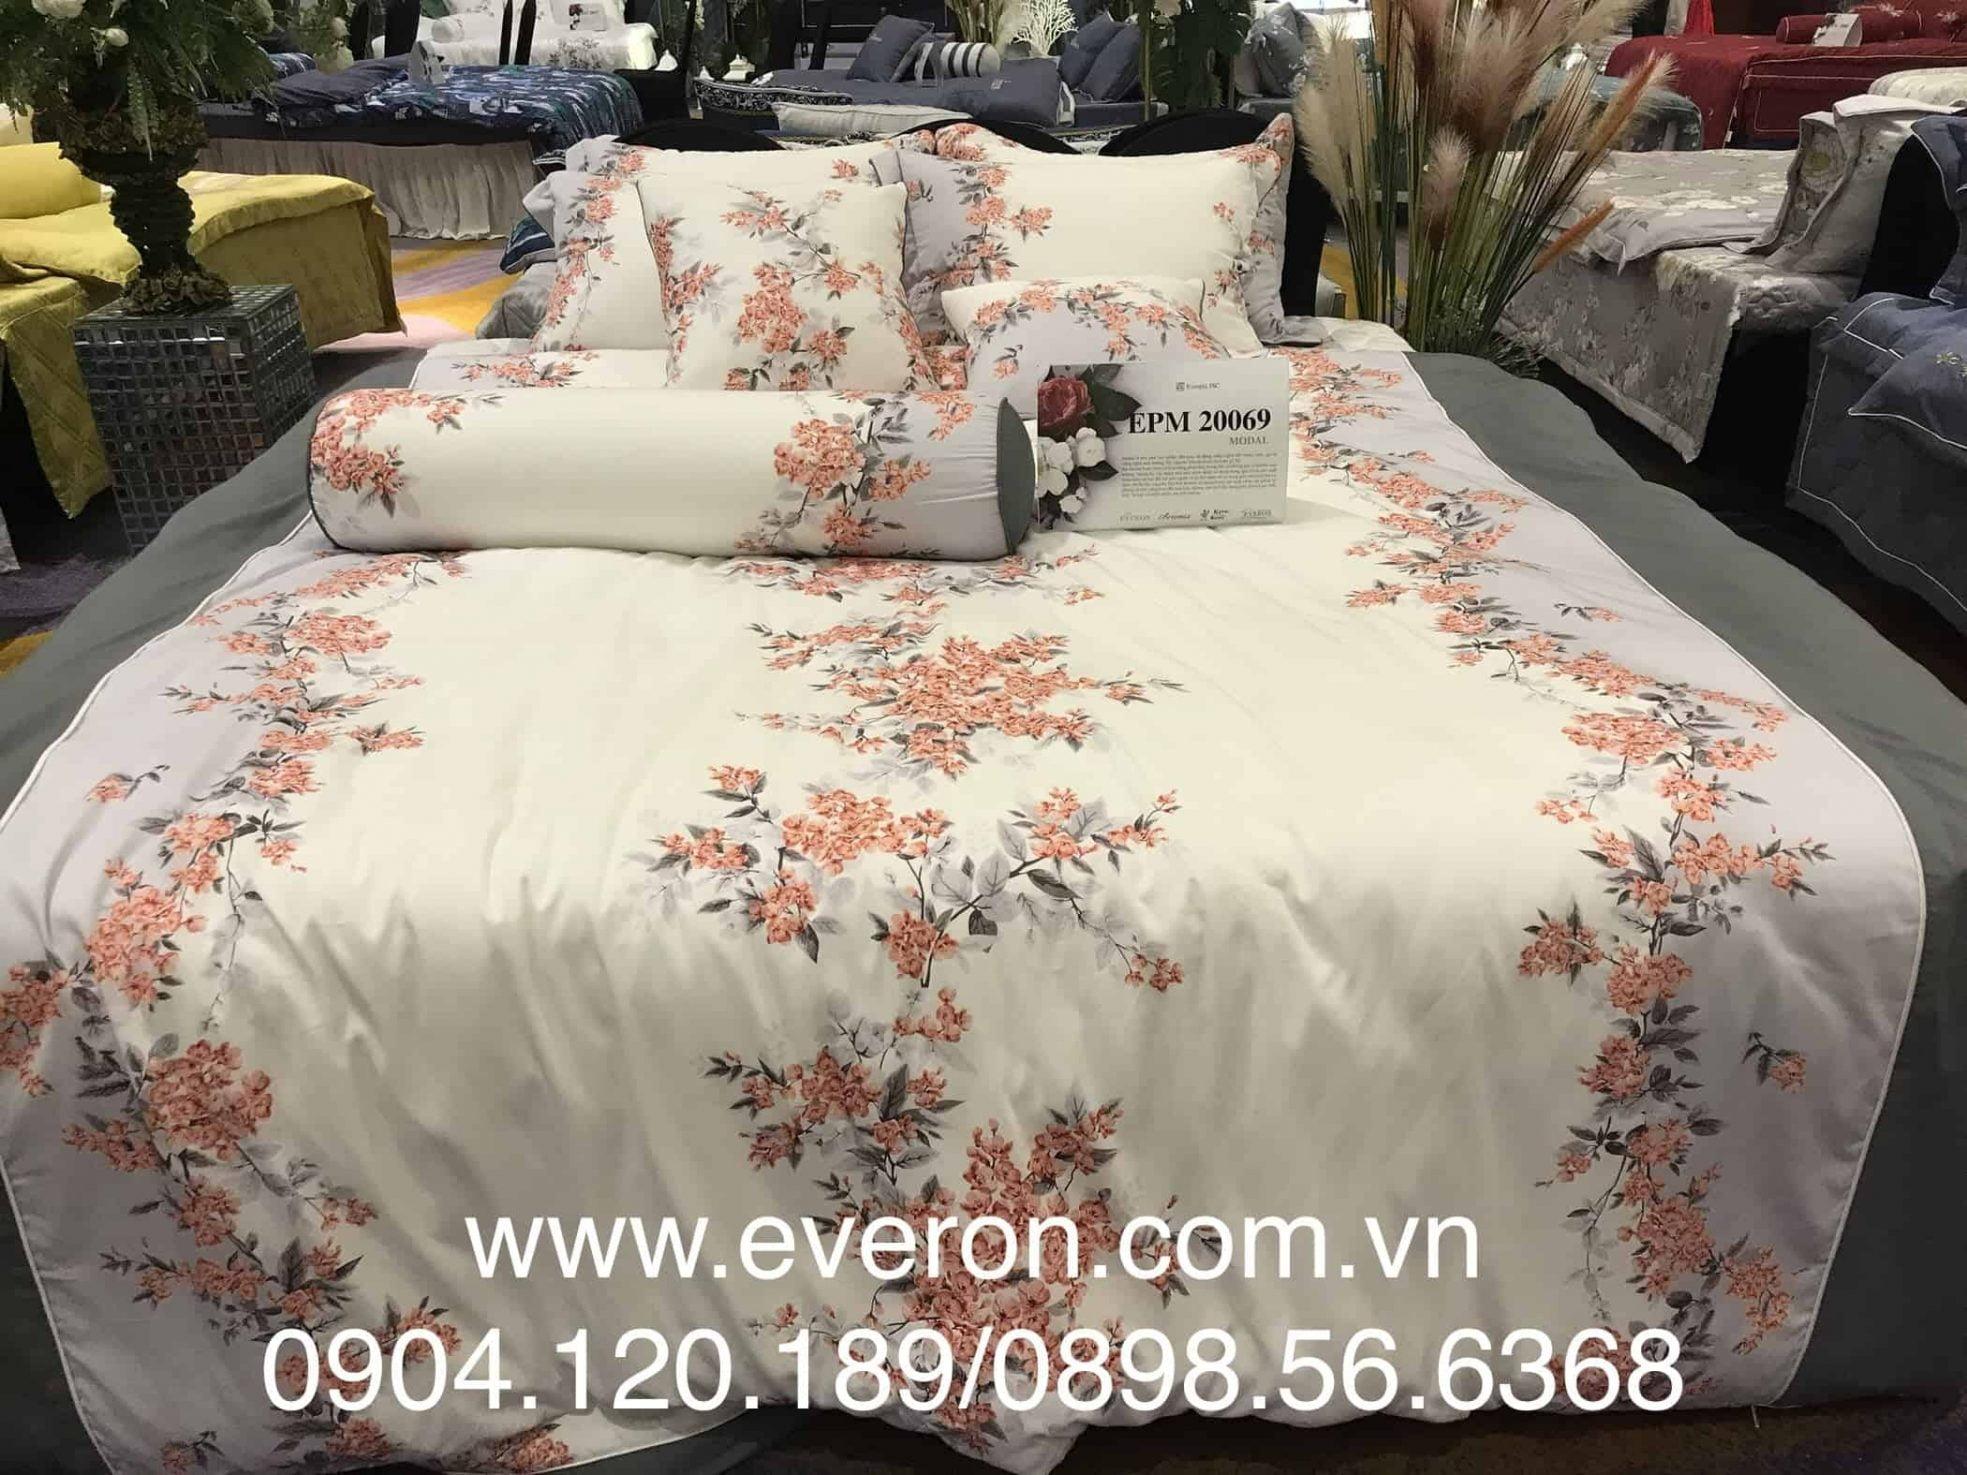 EVERON EPM 20069